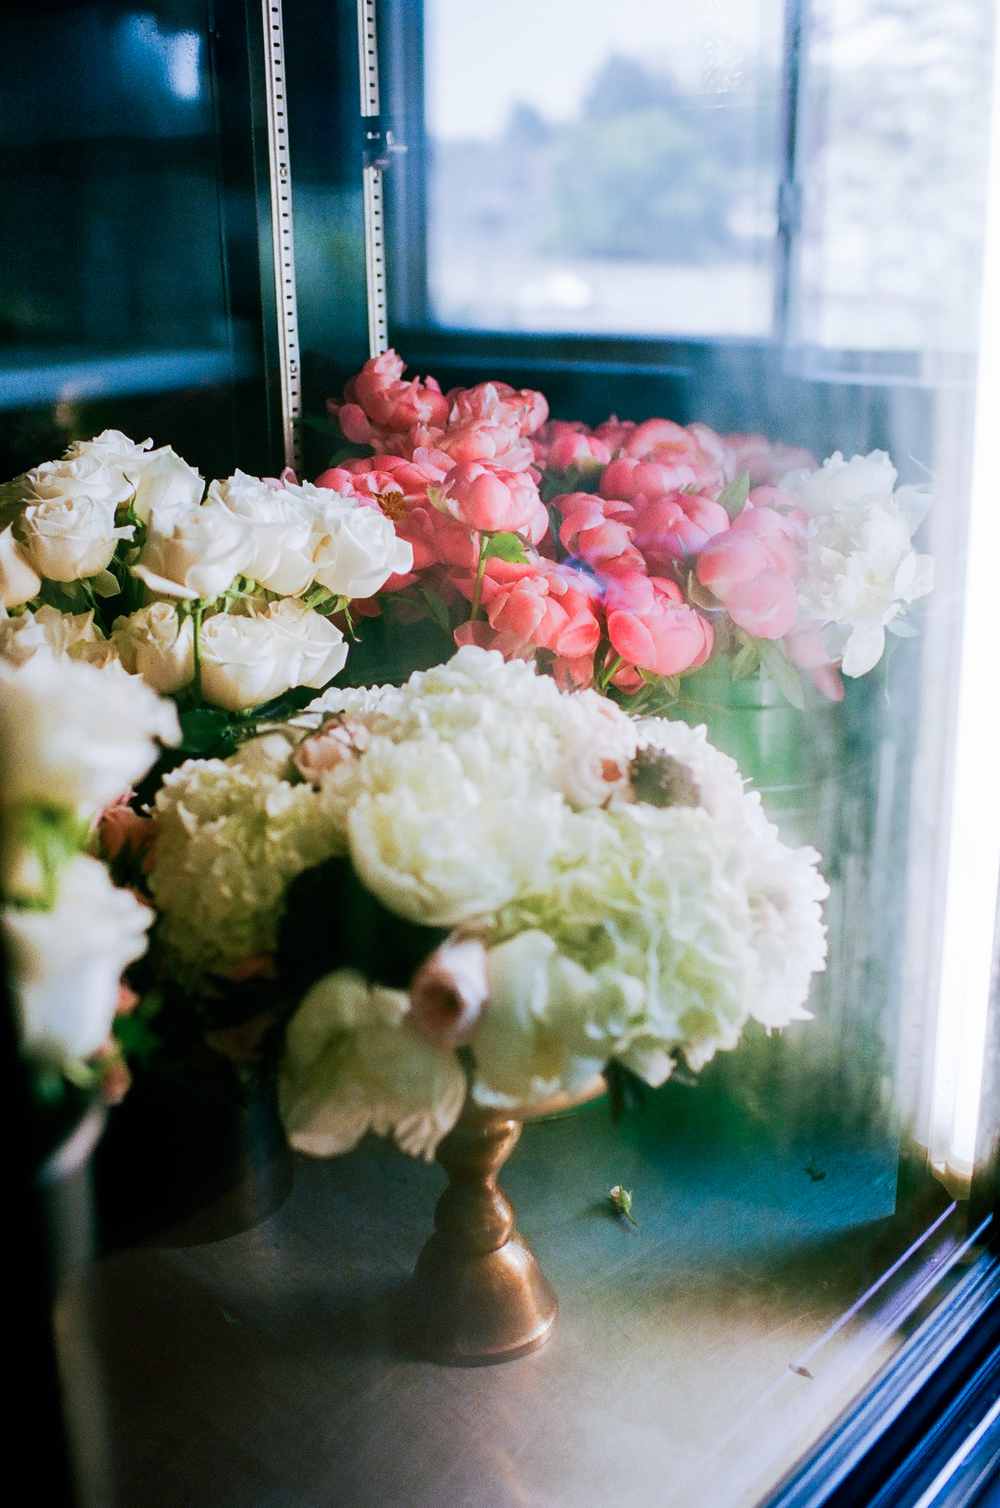 Blue-Daisy-Floral-Designs-042.jpg